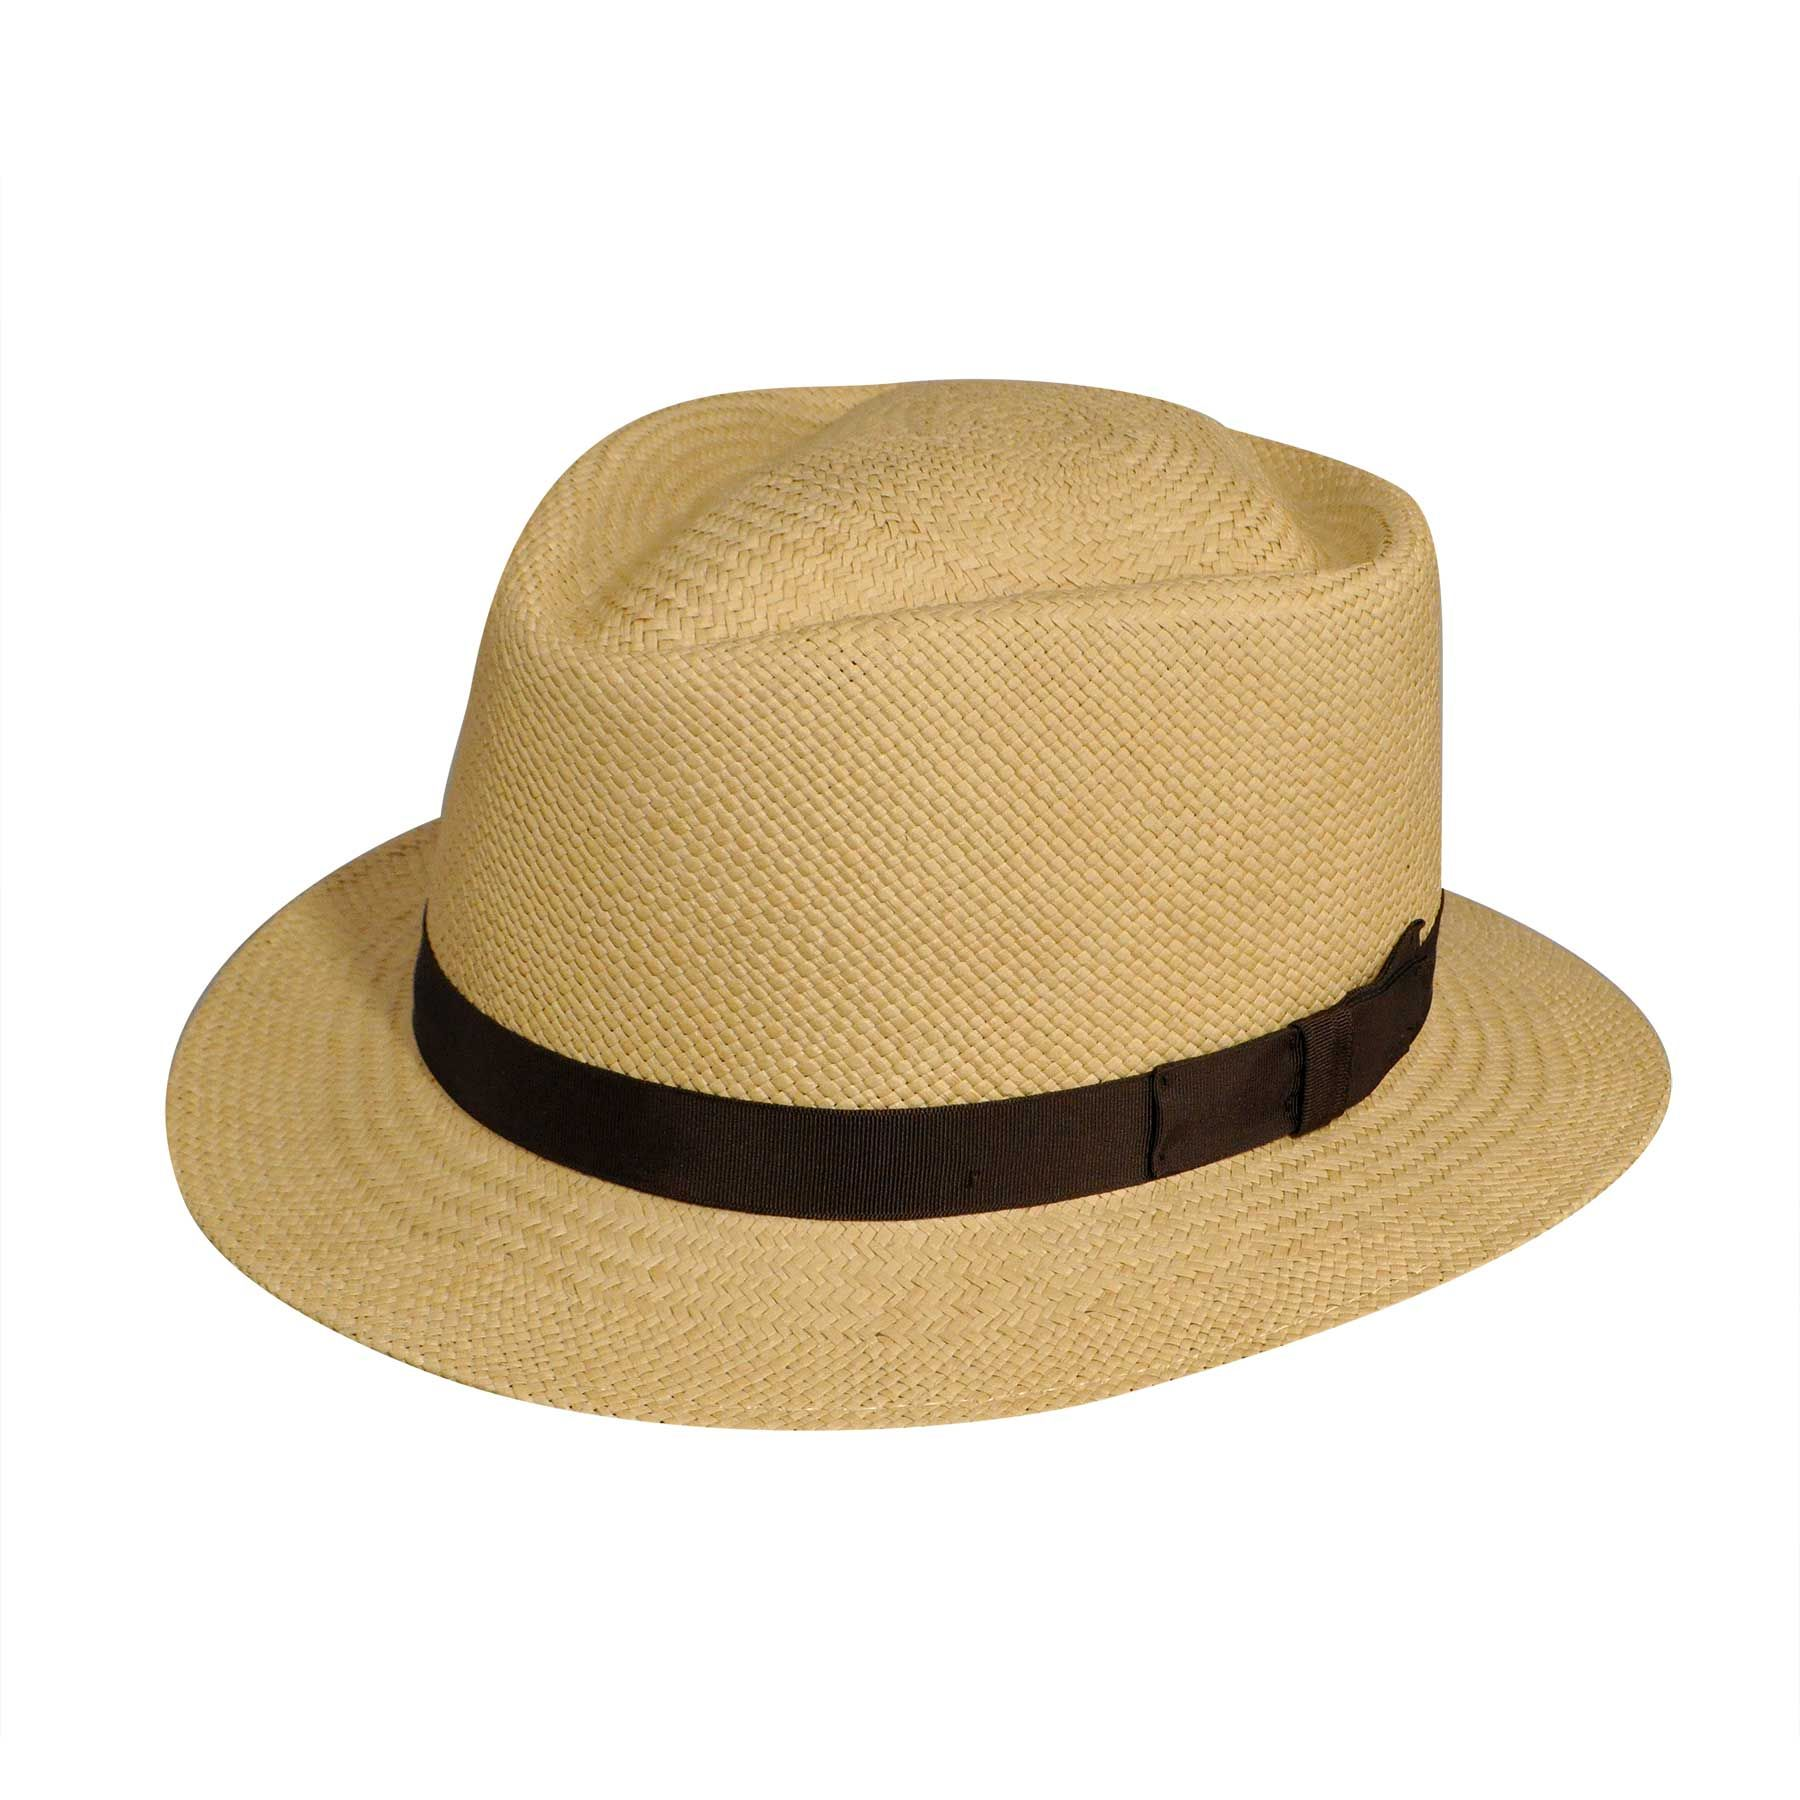 Men S Vintage Style Hats Mens Hats Fashion Hats For Men Vintage Style Hat